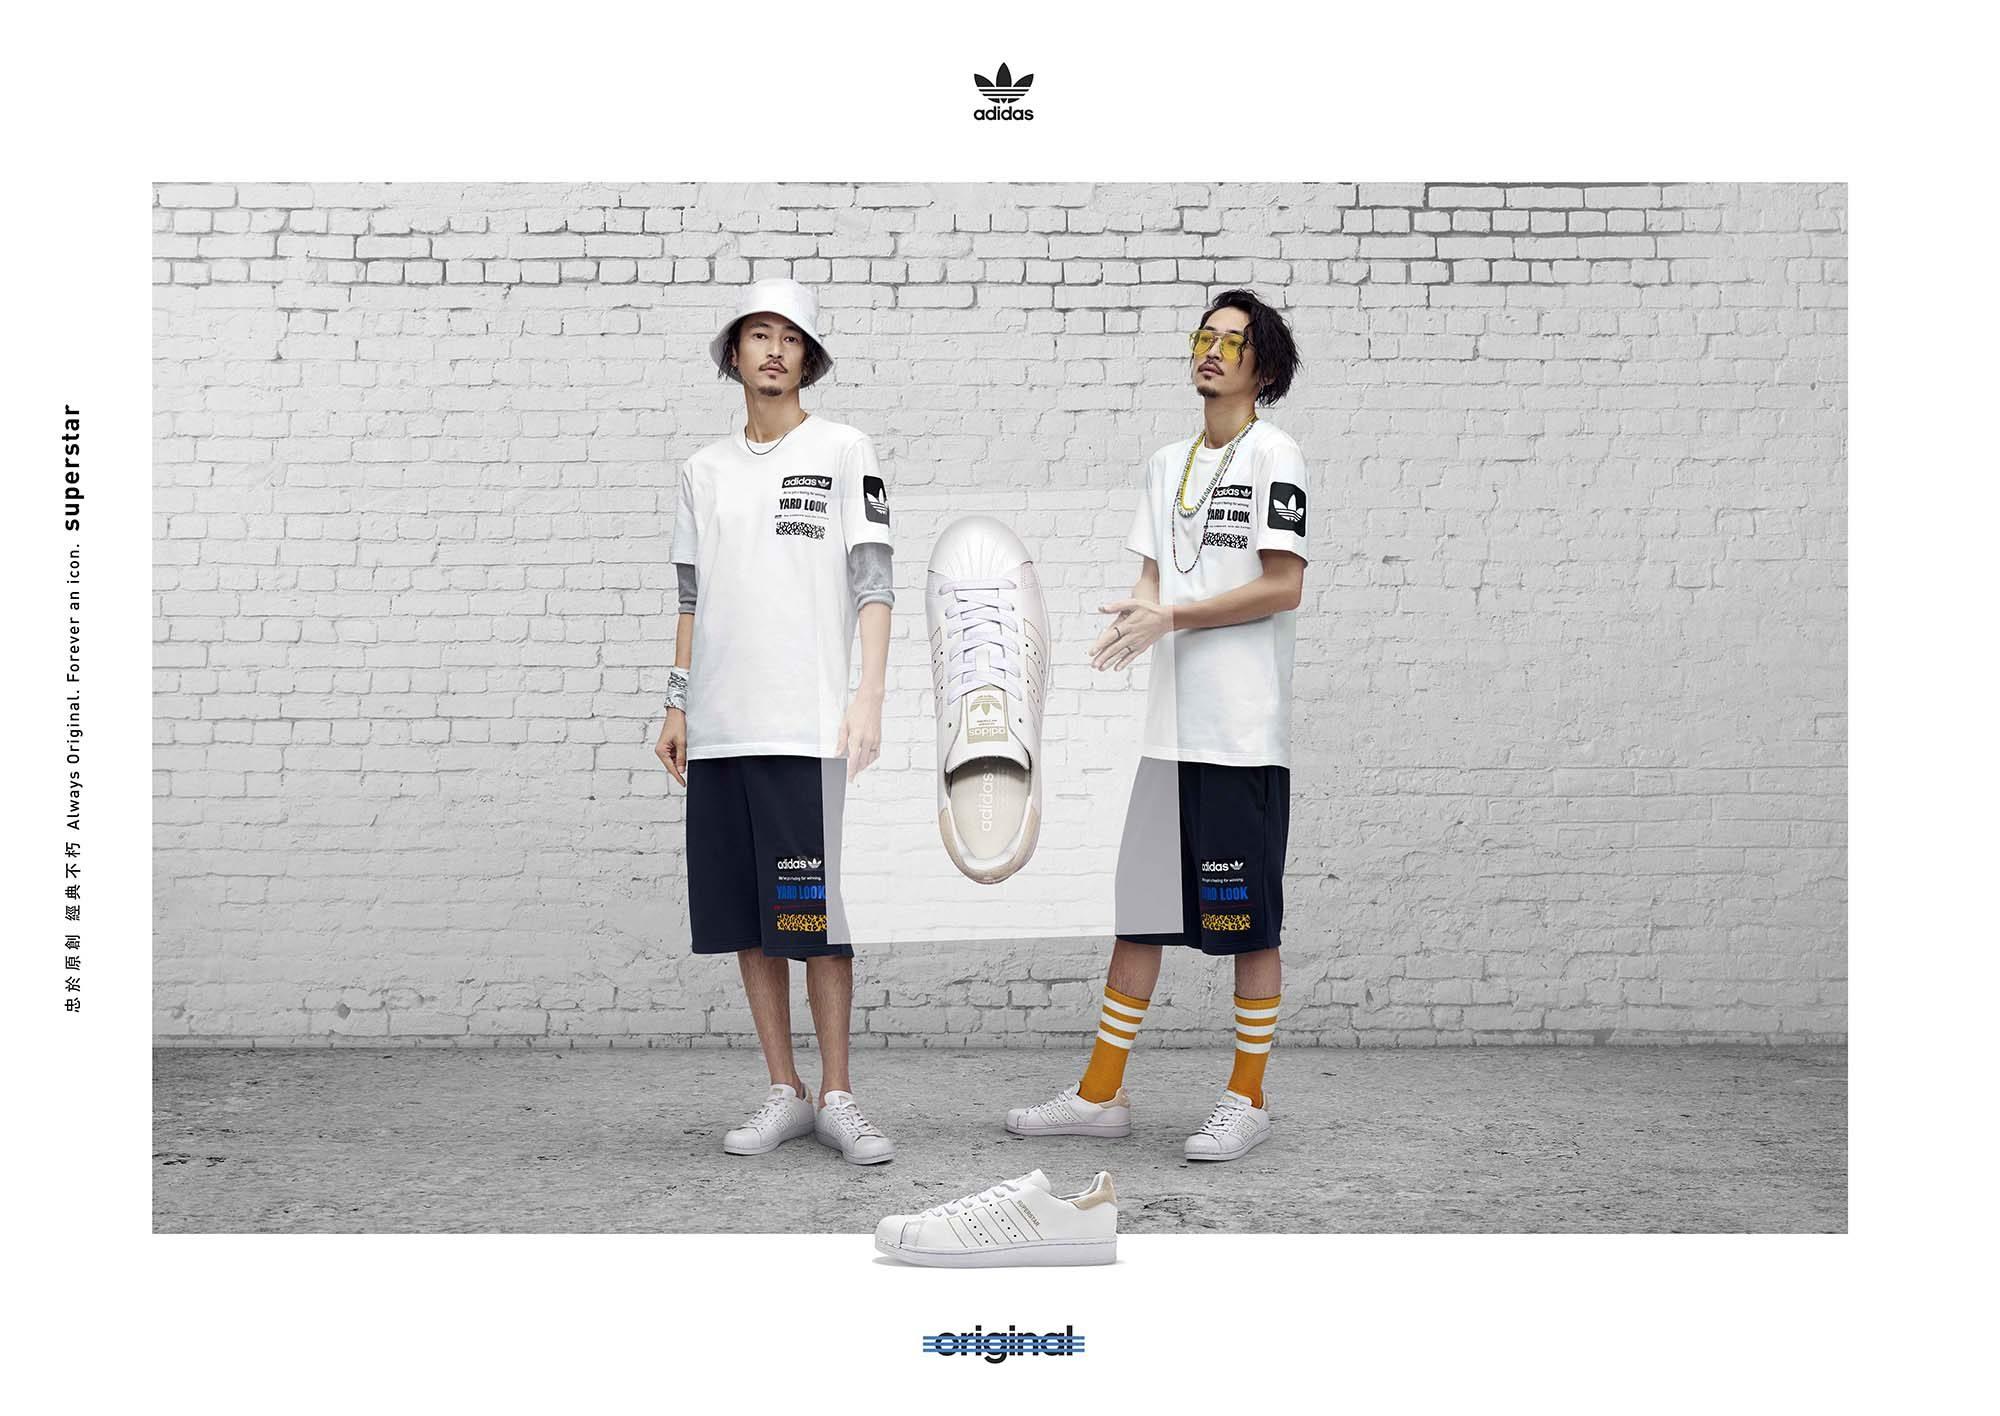 adidas-originals-osaka-wear-series-02